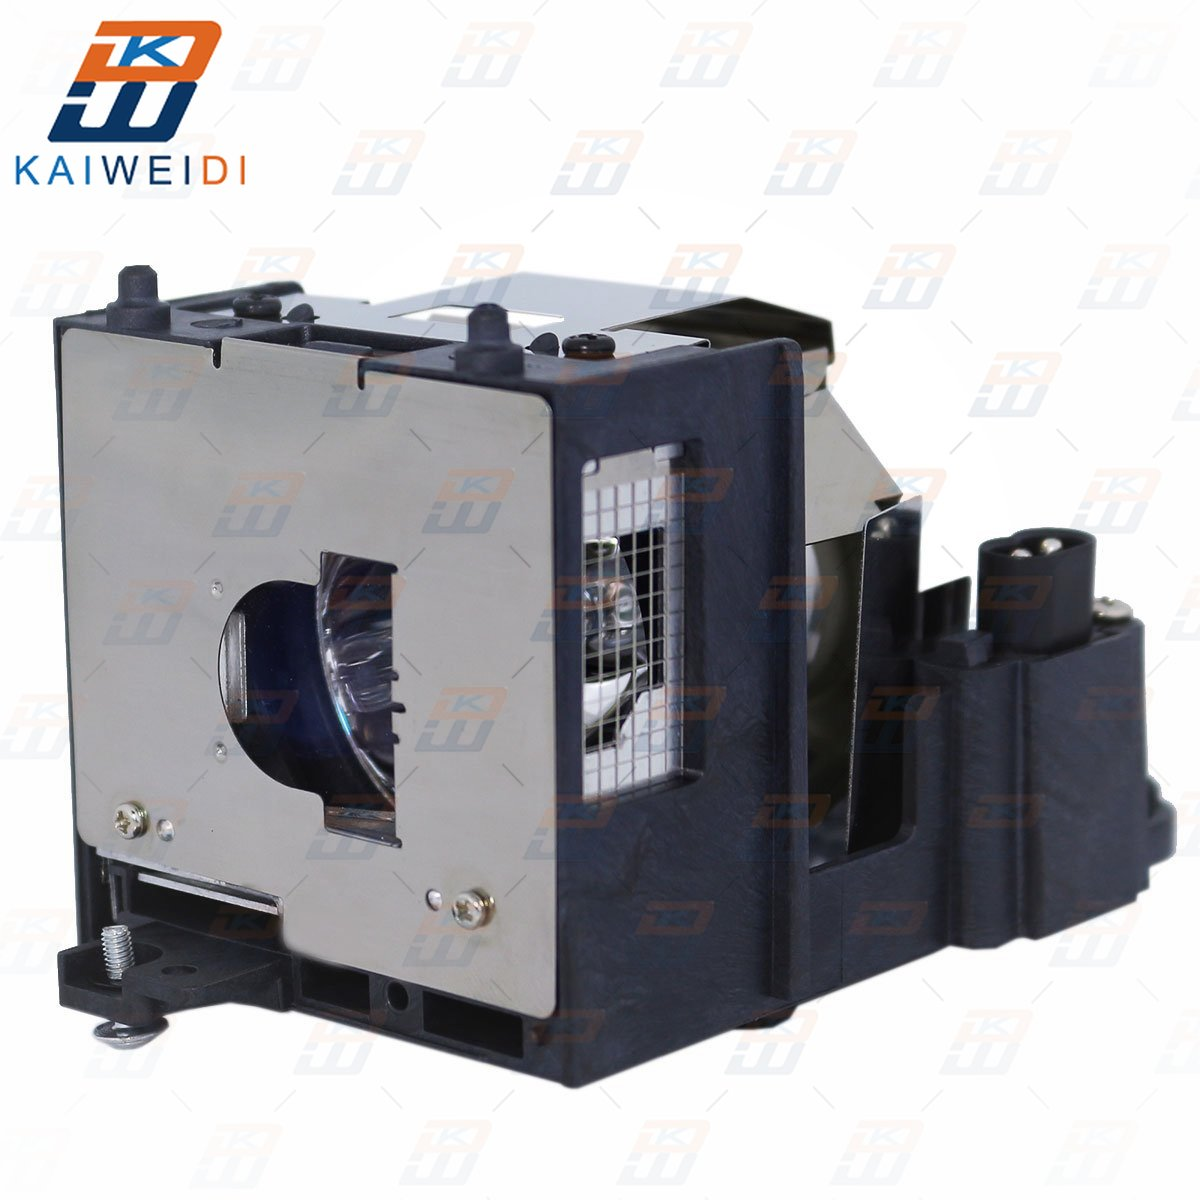 AN-XR10L2 Lamp For Sharp XGMB50X XGMB50XL XR-10S-L XR-10S XR-10SL XR10S XR10SL XR-10X-L XR-10X XR-10X-L 10XL XR10X XR10XL